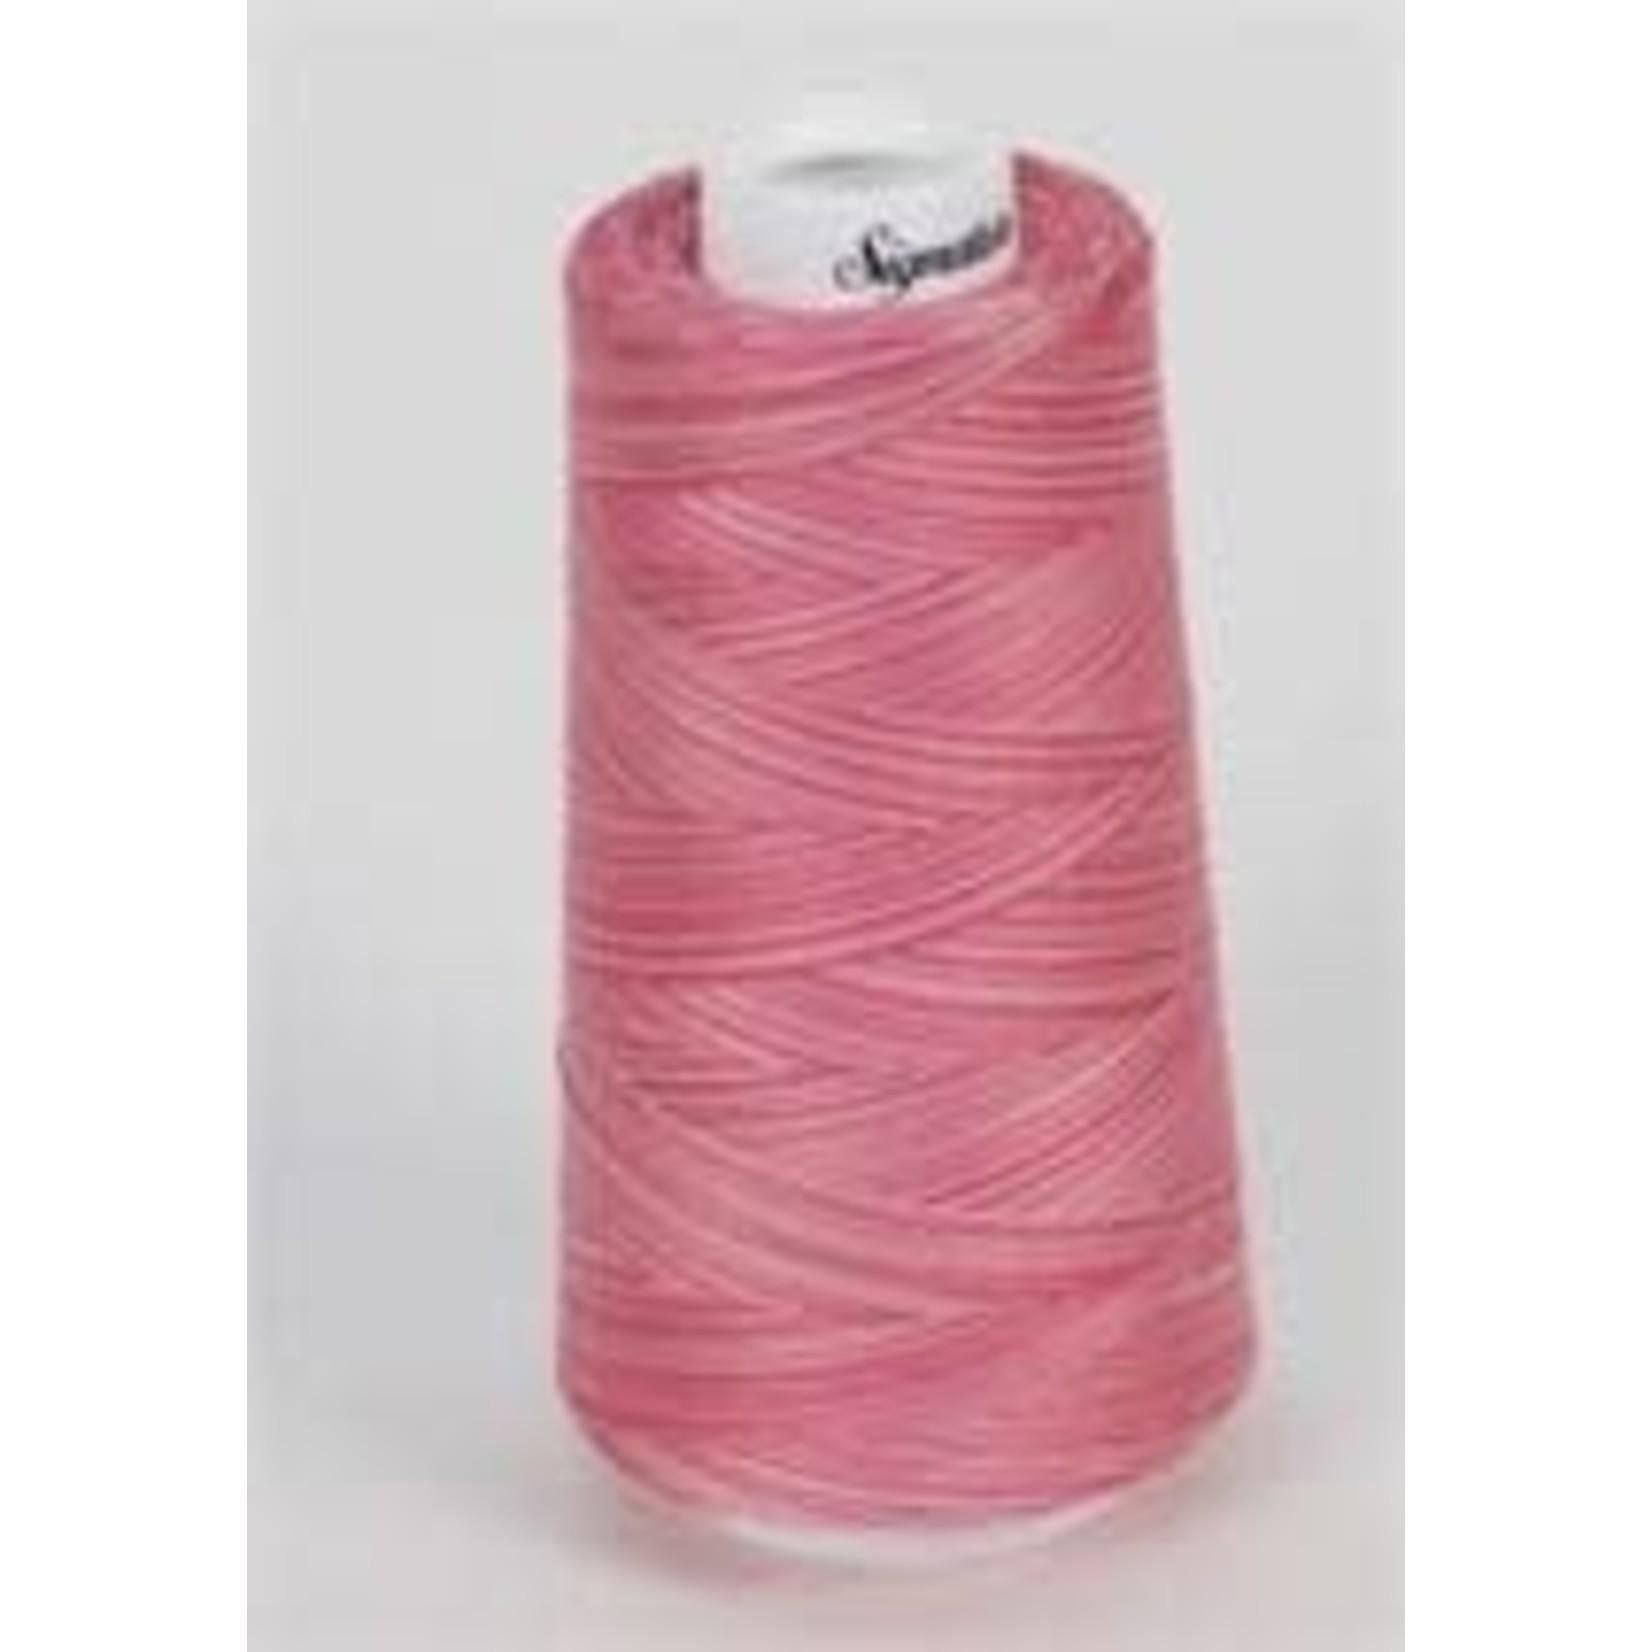 A & E Pinky Pinks, Signature Cotton